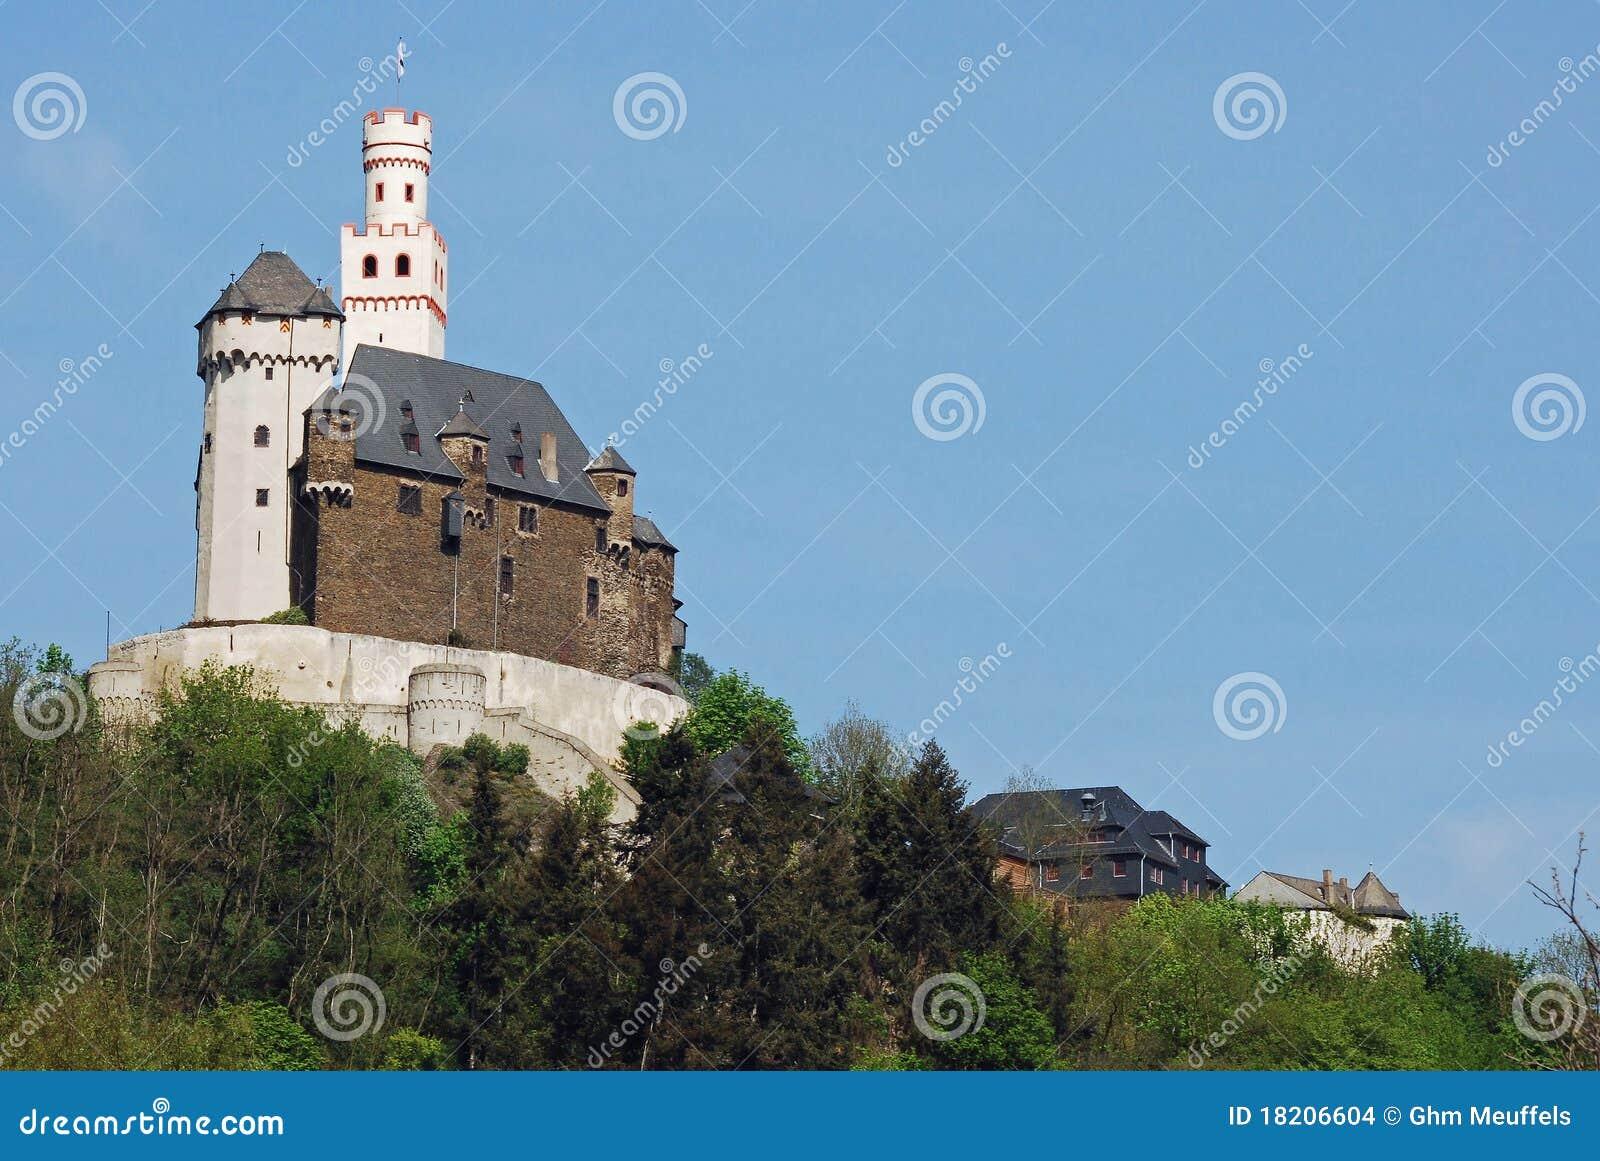 Vieuw on Marksburg Castle, Braubach, Germany